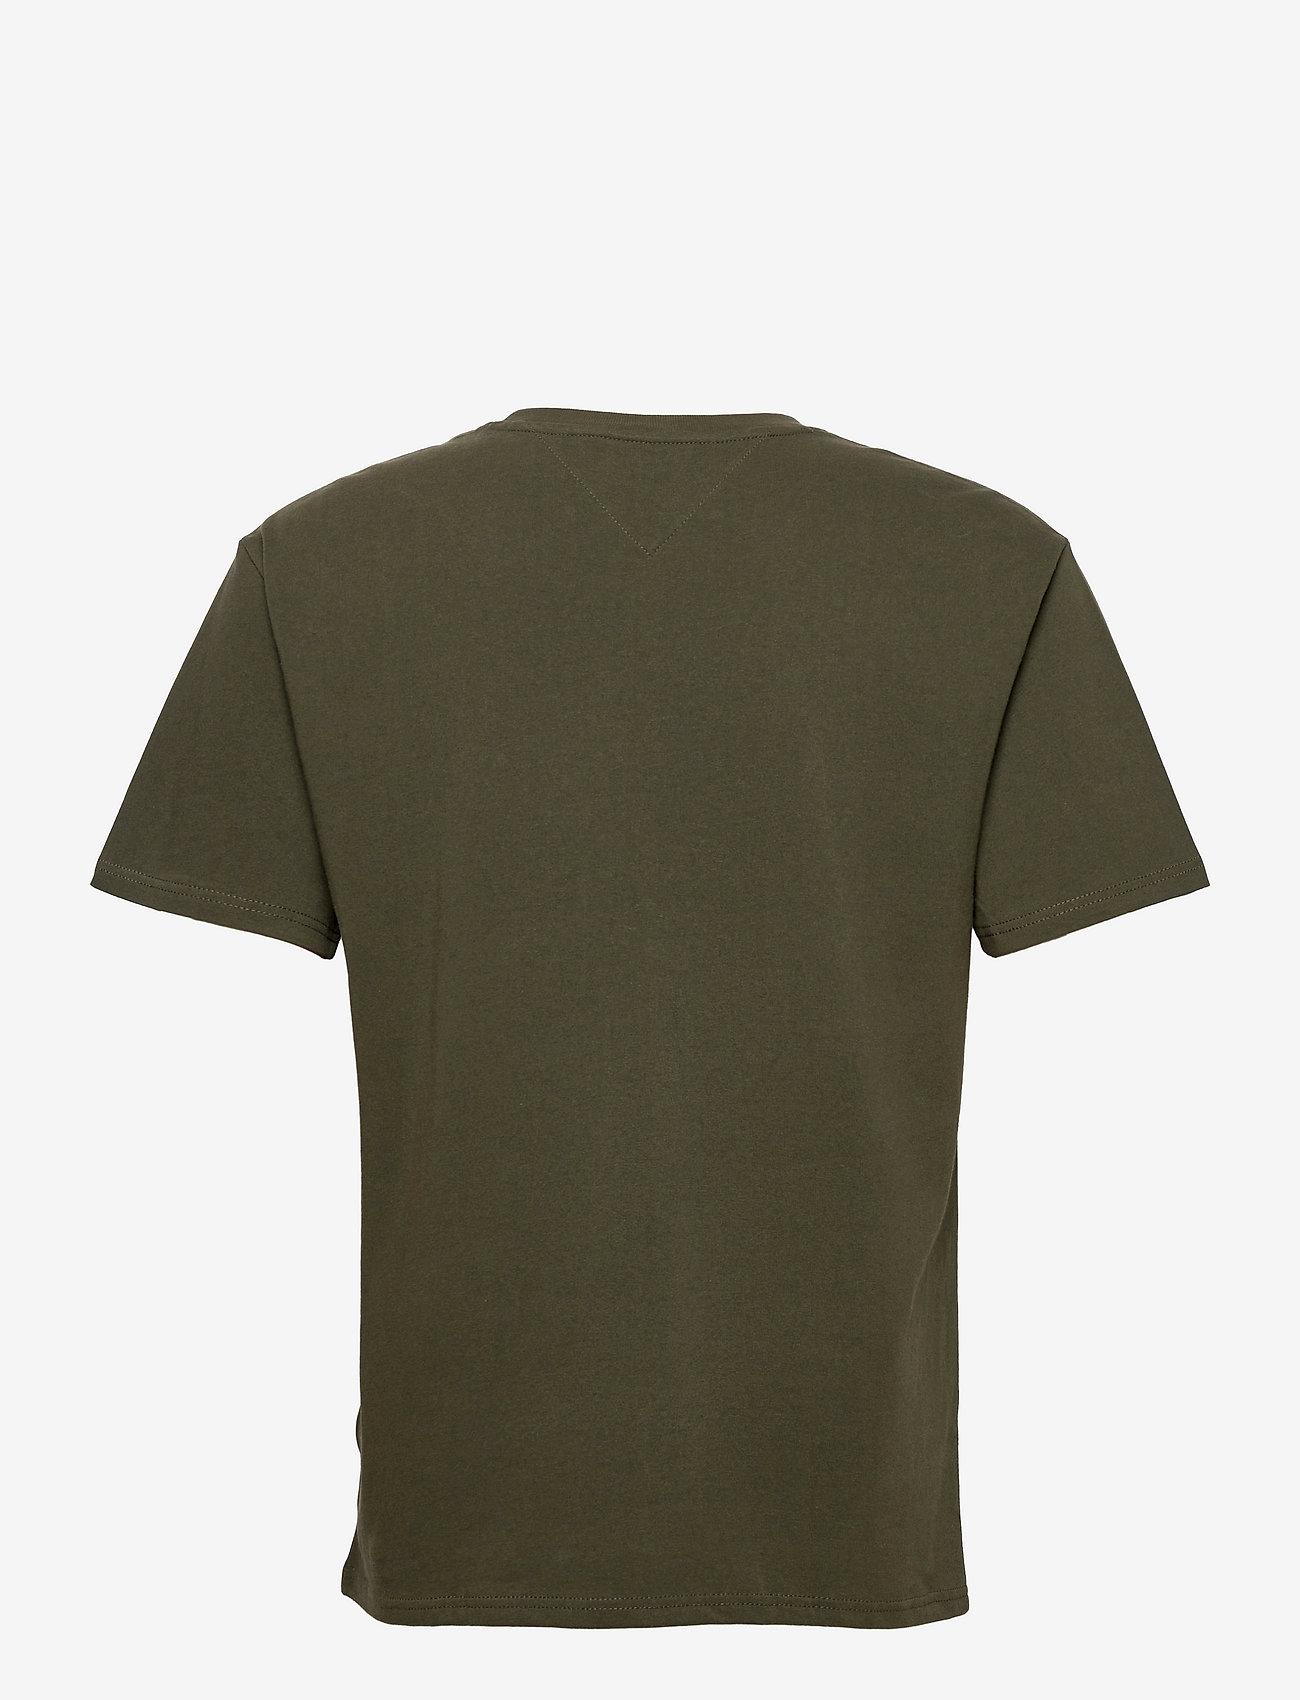 Tommy Jeans - TJM TOMMY BADGE TEE - kortärmade t-shirts - dark olive - 1